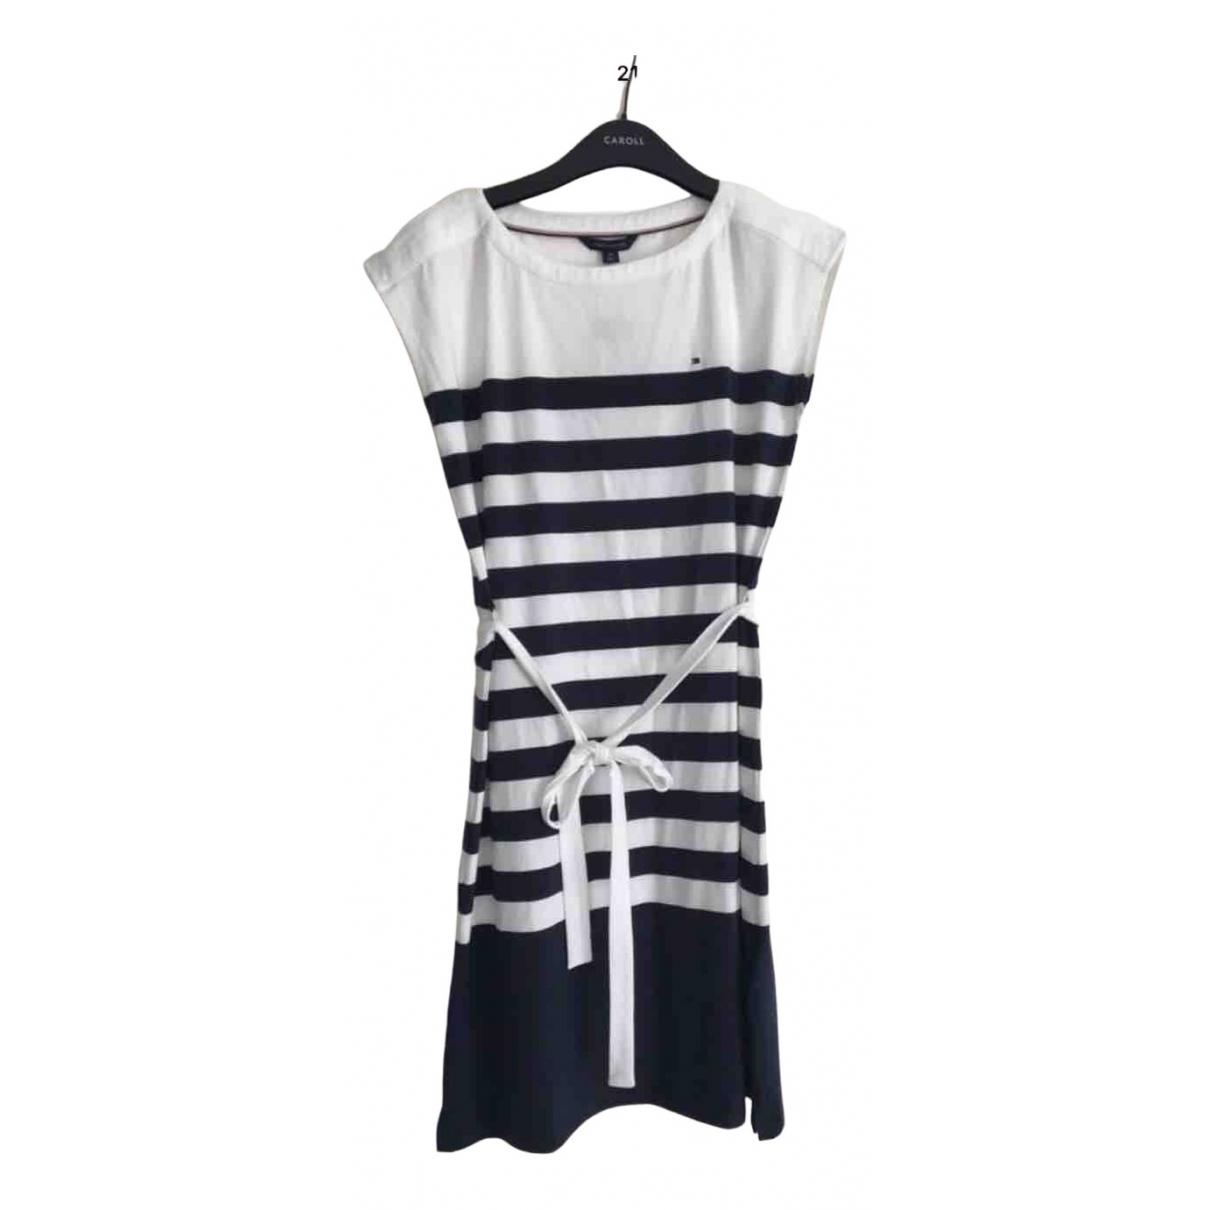 Tommy Hilfiger \N Navy Cotton dress for Women 36 FR